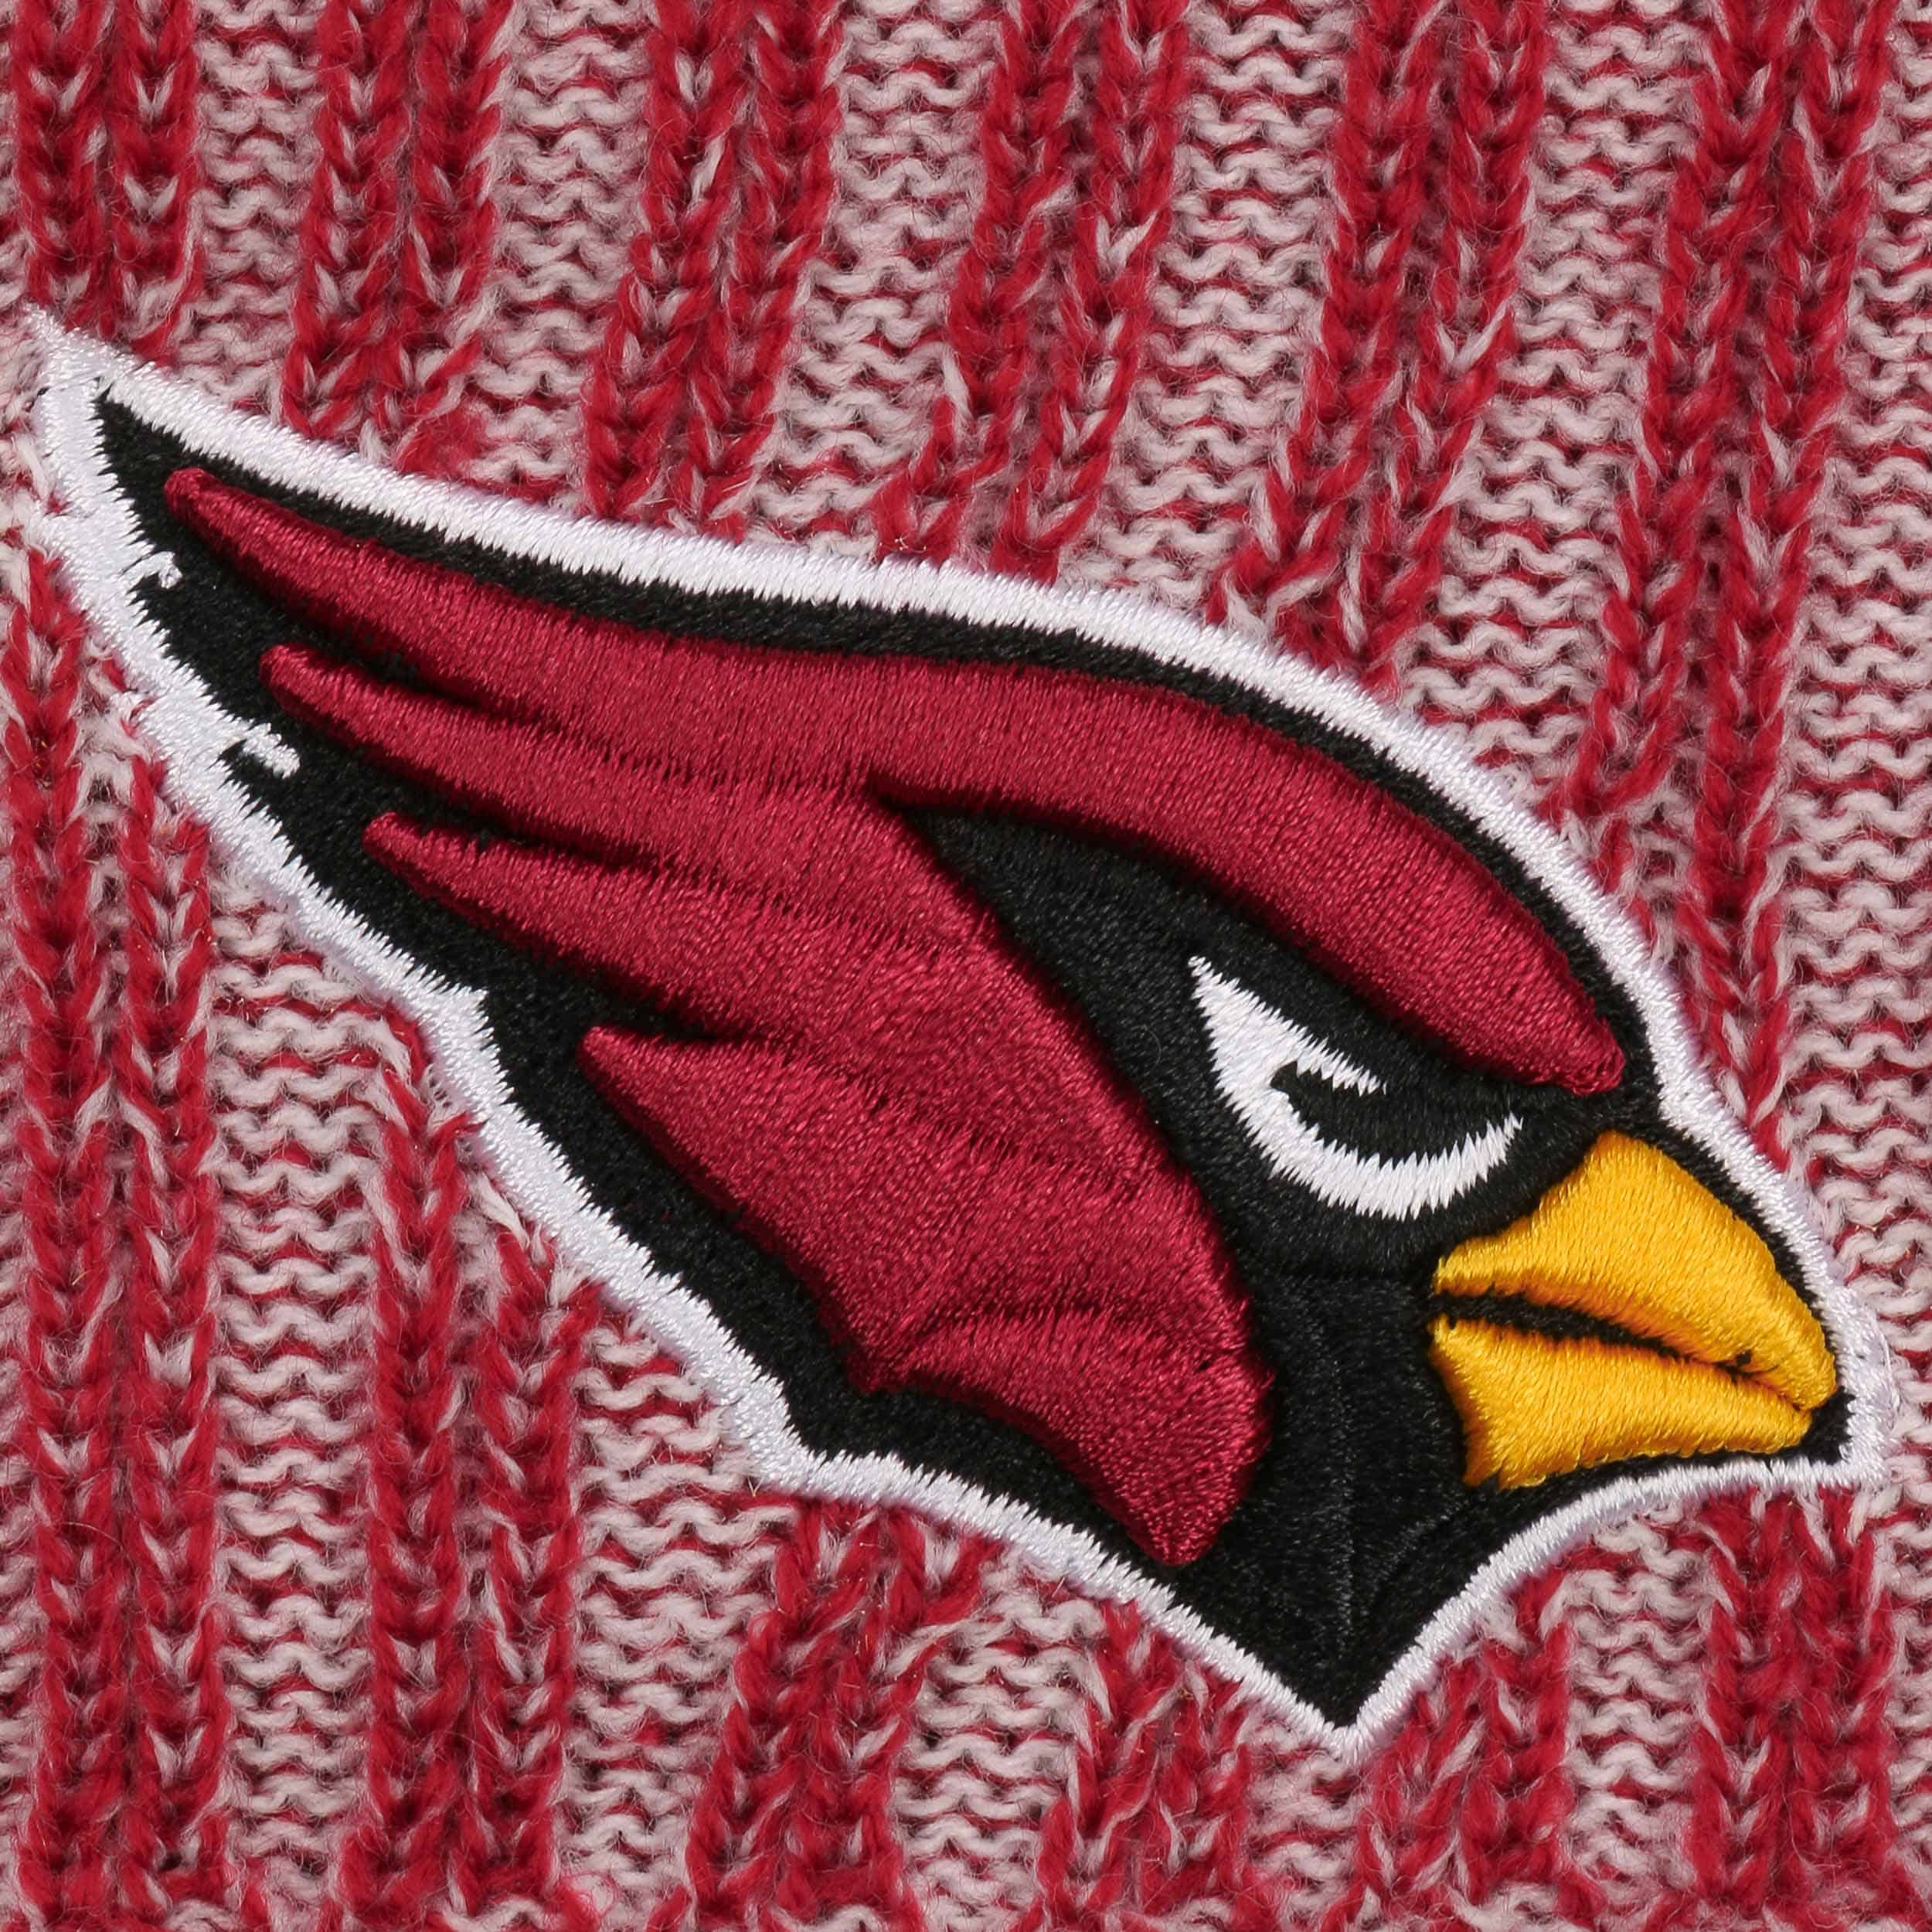 ... NFL Cardinals Beanie by New Era - red 3 ... 68752e1a5